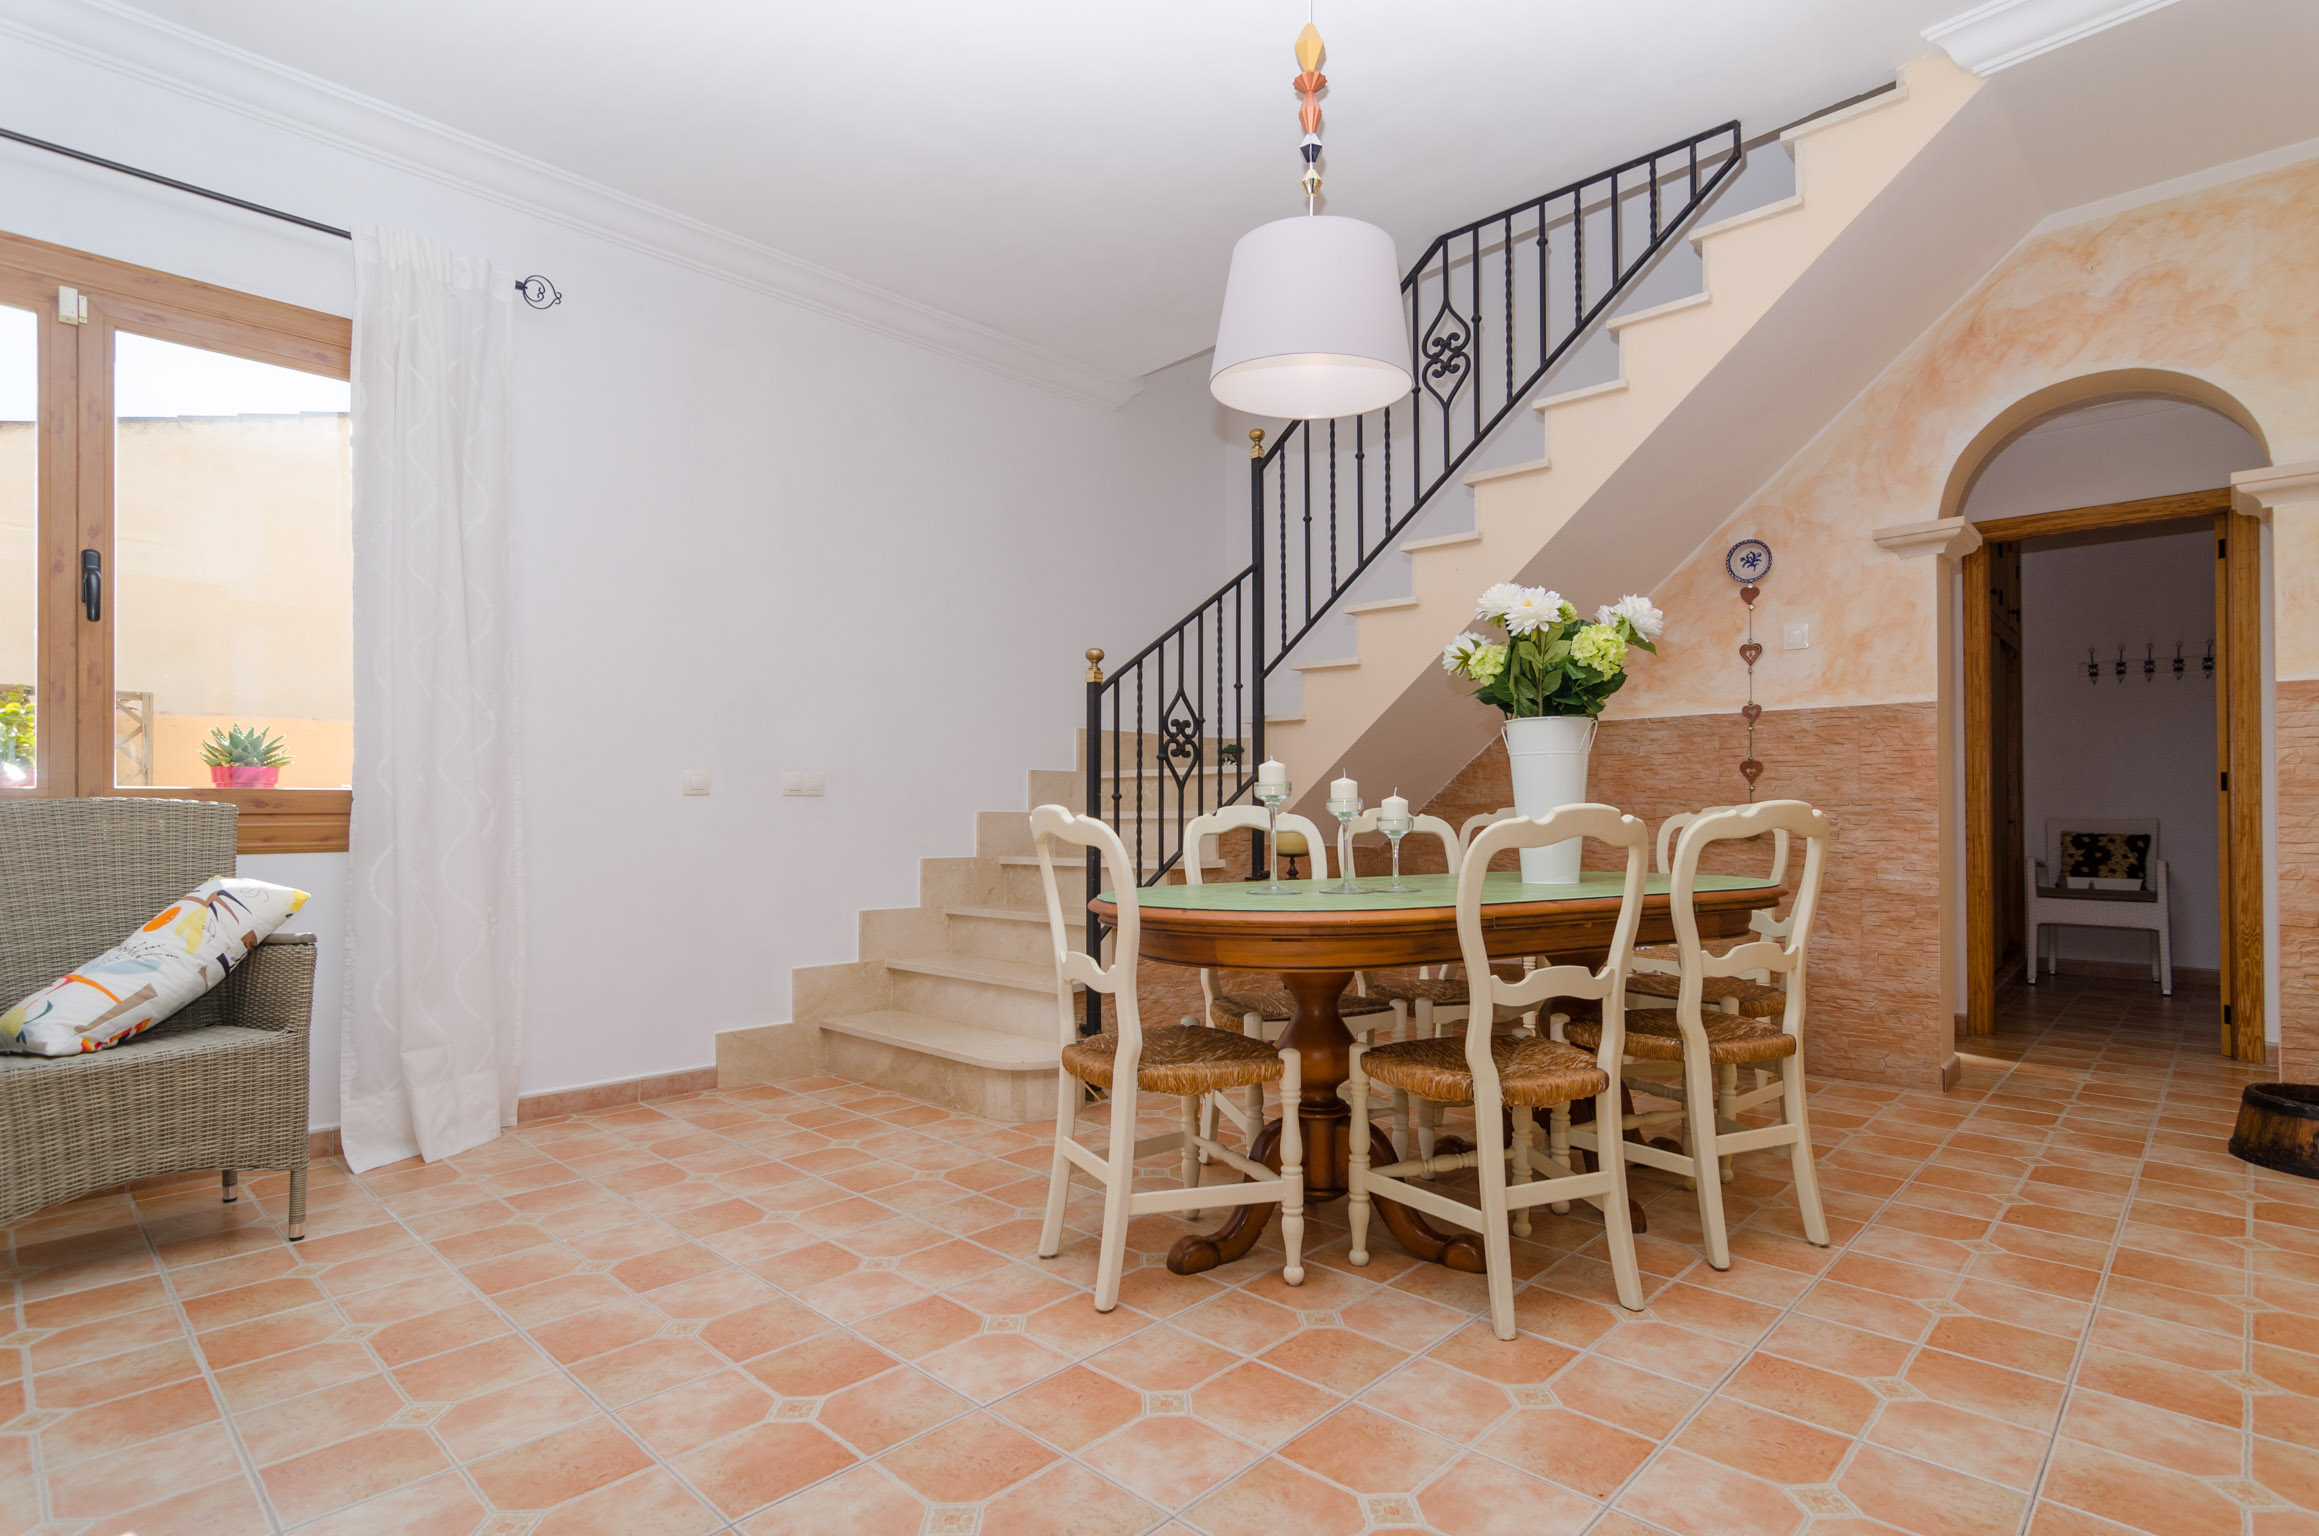 Ferienhaus SANT BLAI VELL (2284789), Campos, Mallorca, Balearische Inseln, Spanien, Bild 14